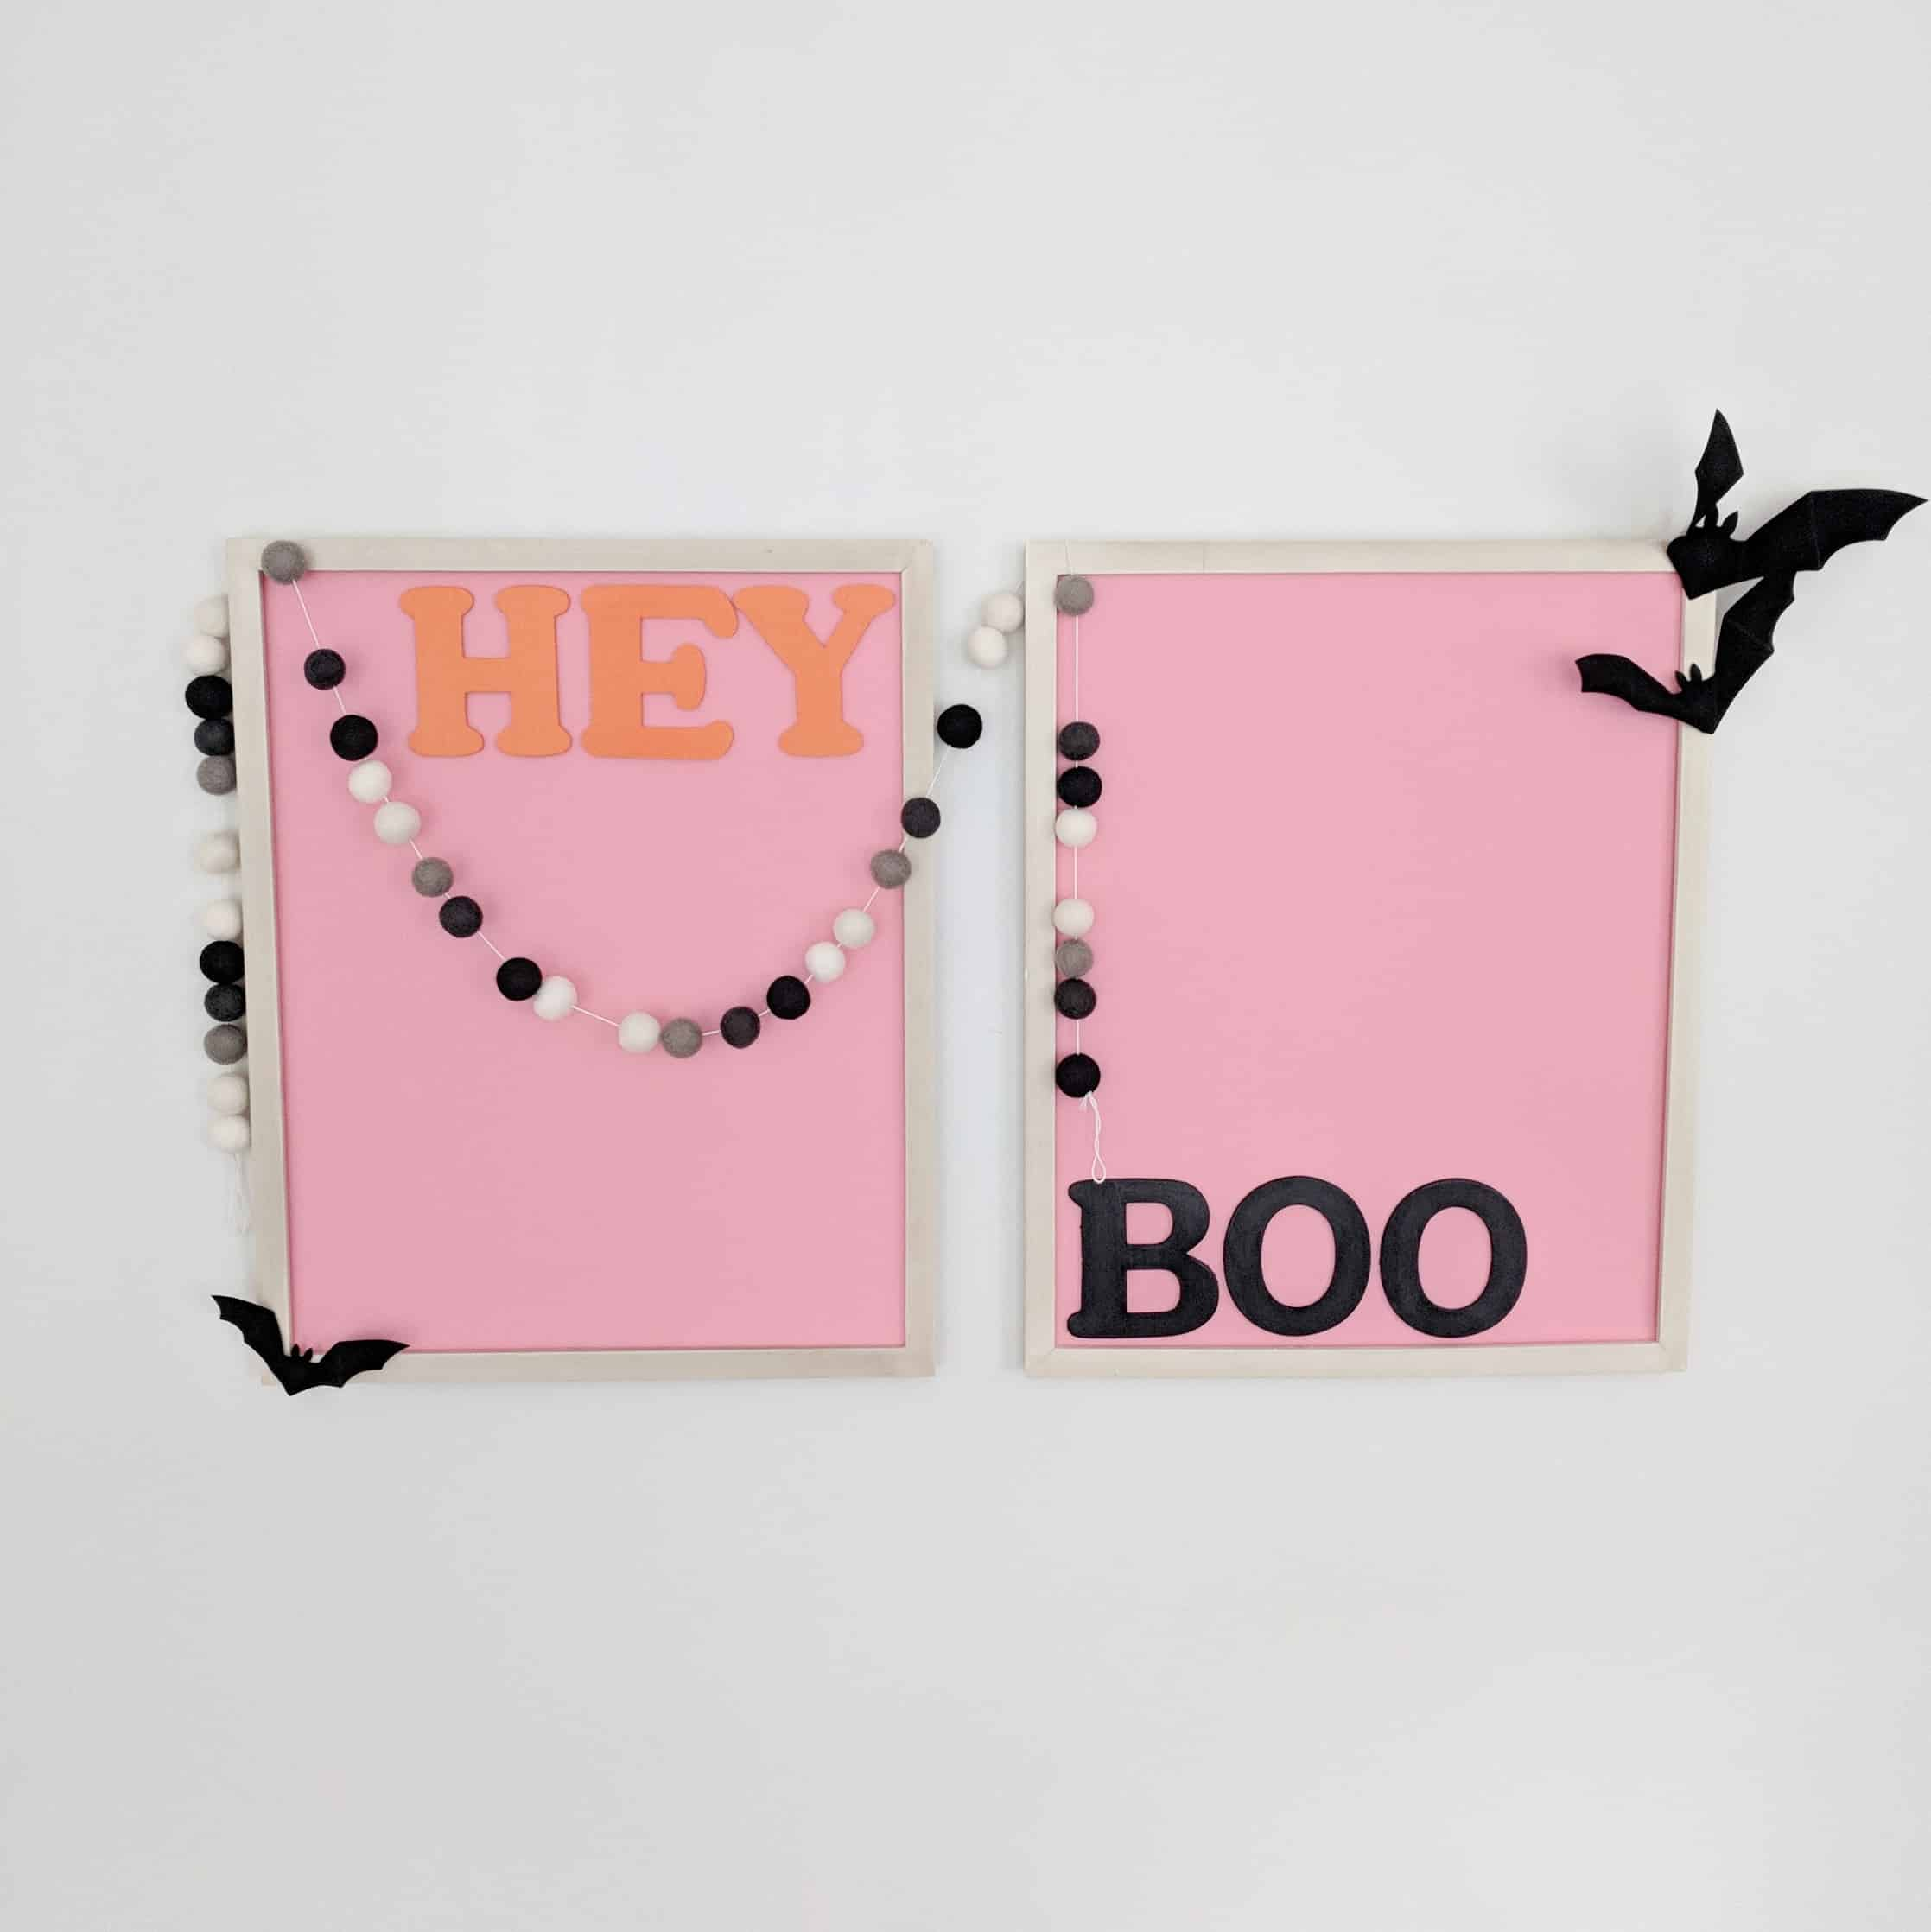 hey boo framed prints